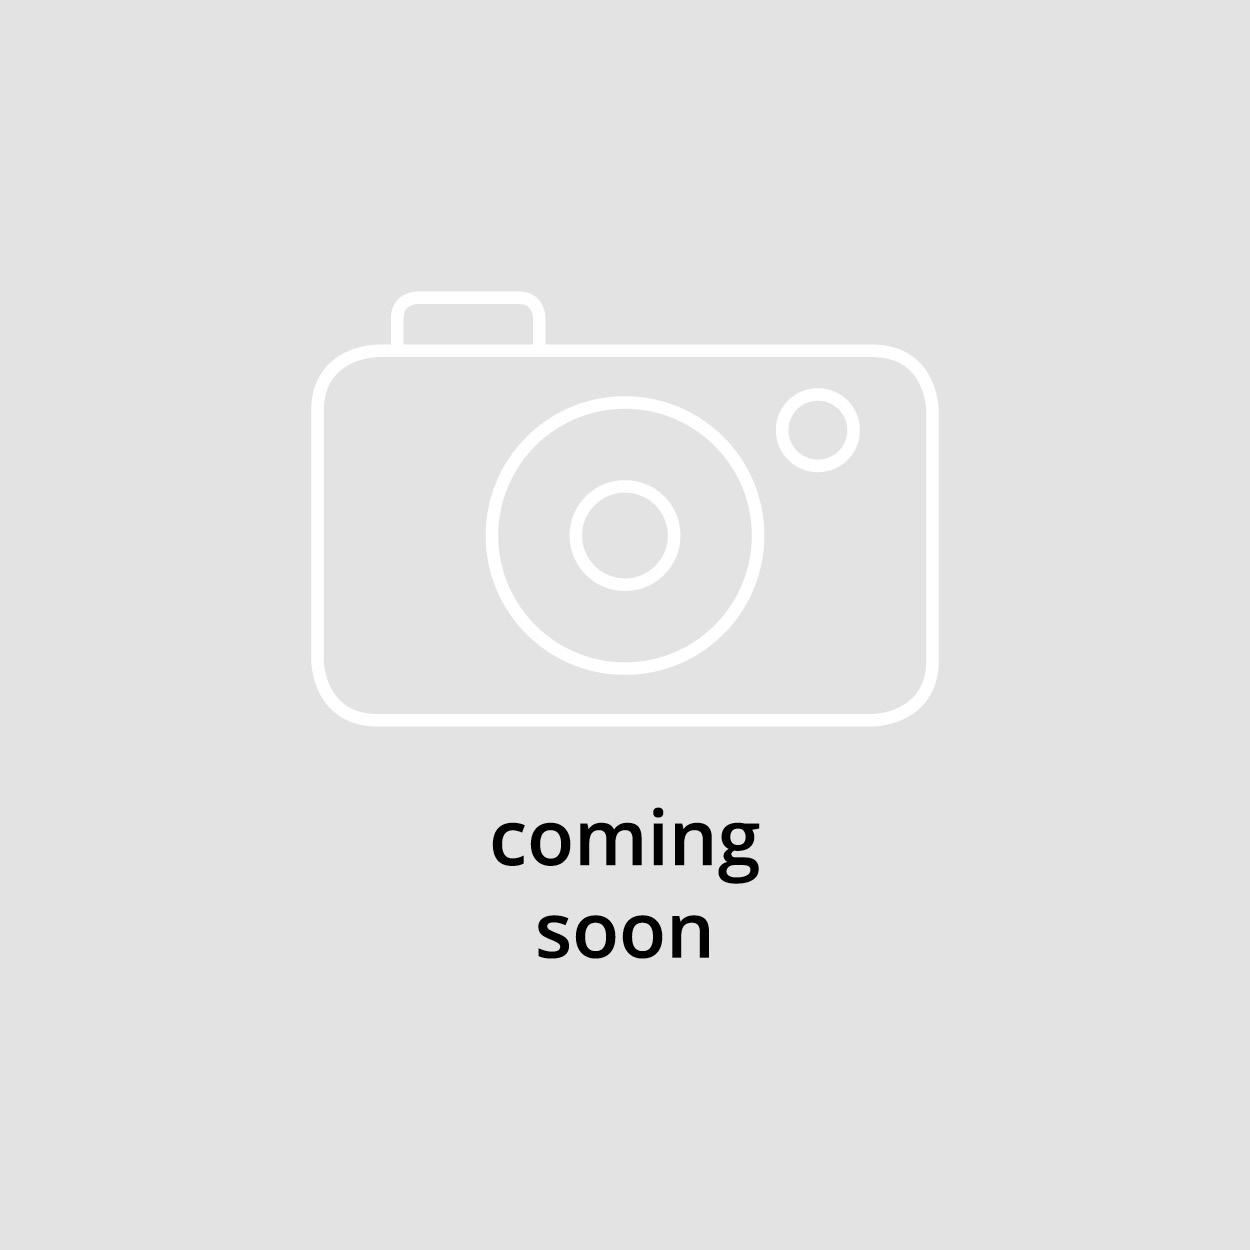 35.01.133 Ghiera per tamburo Gildemeister GM35, GM35AC